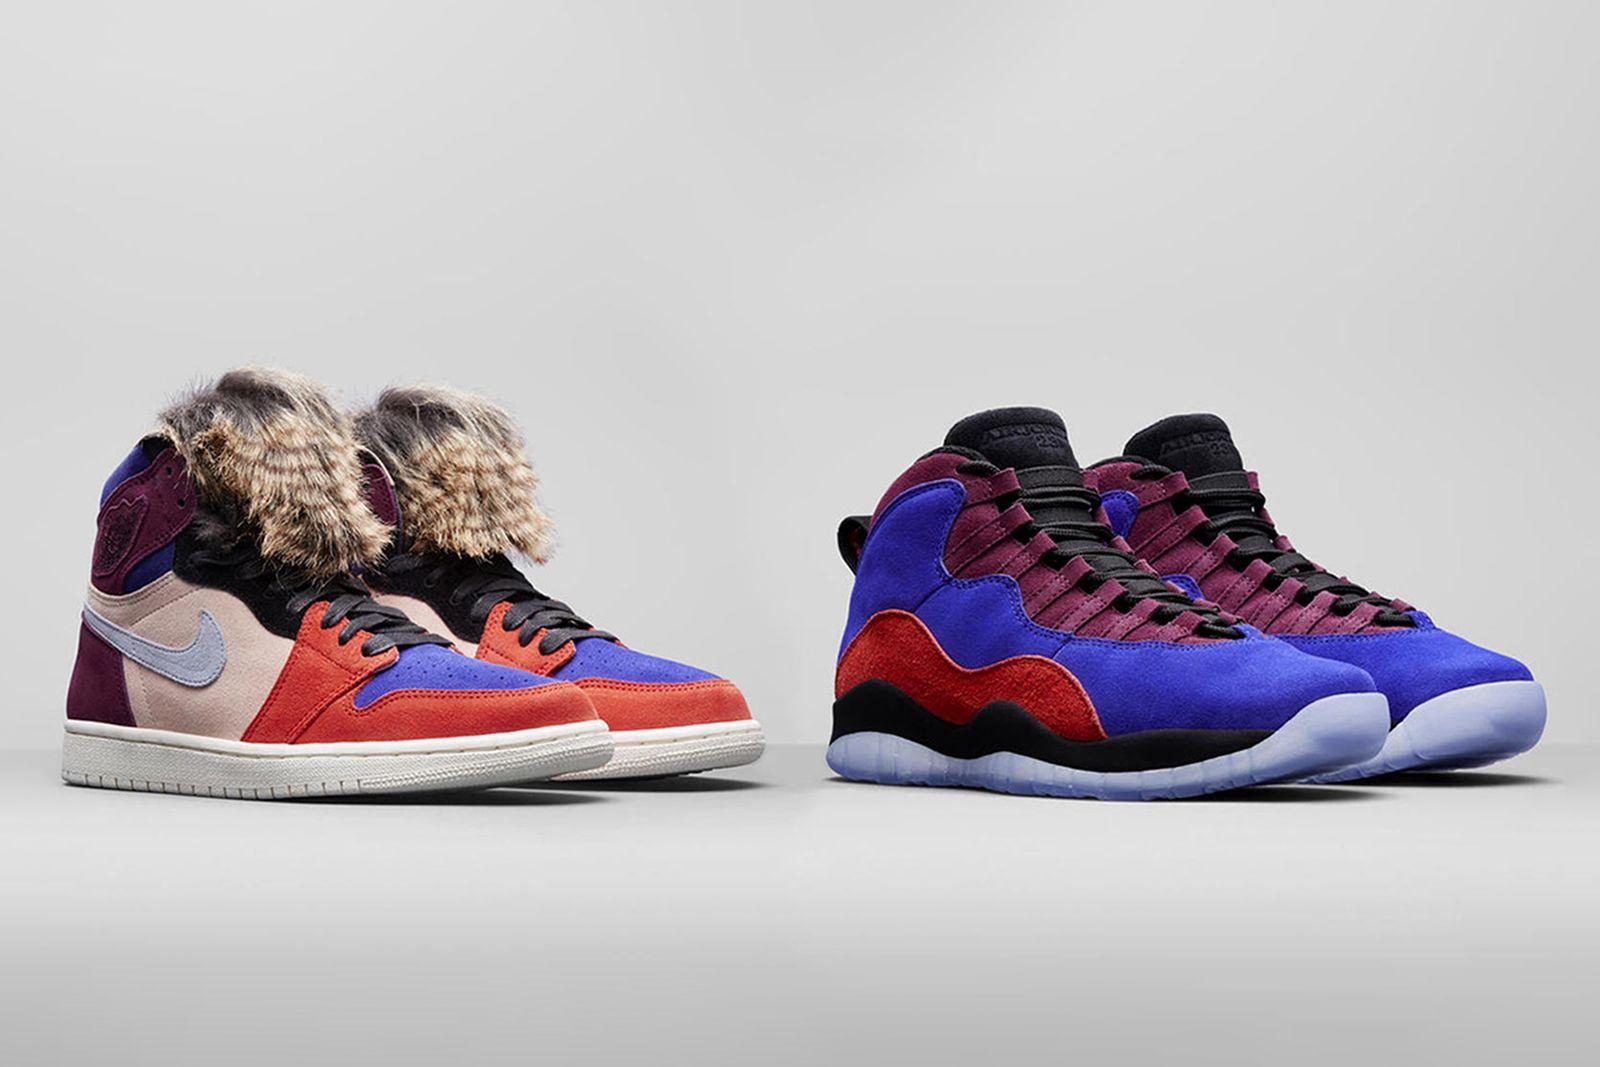 Aleali May x Wmns Air Jordan 1 Retro High 'Court Lux'